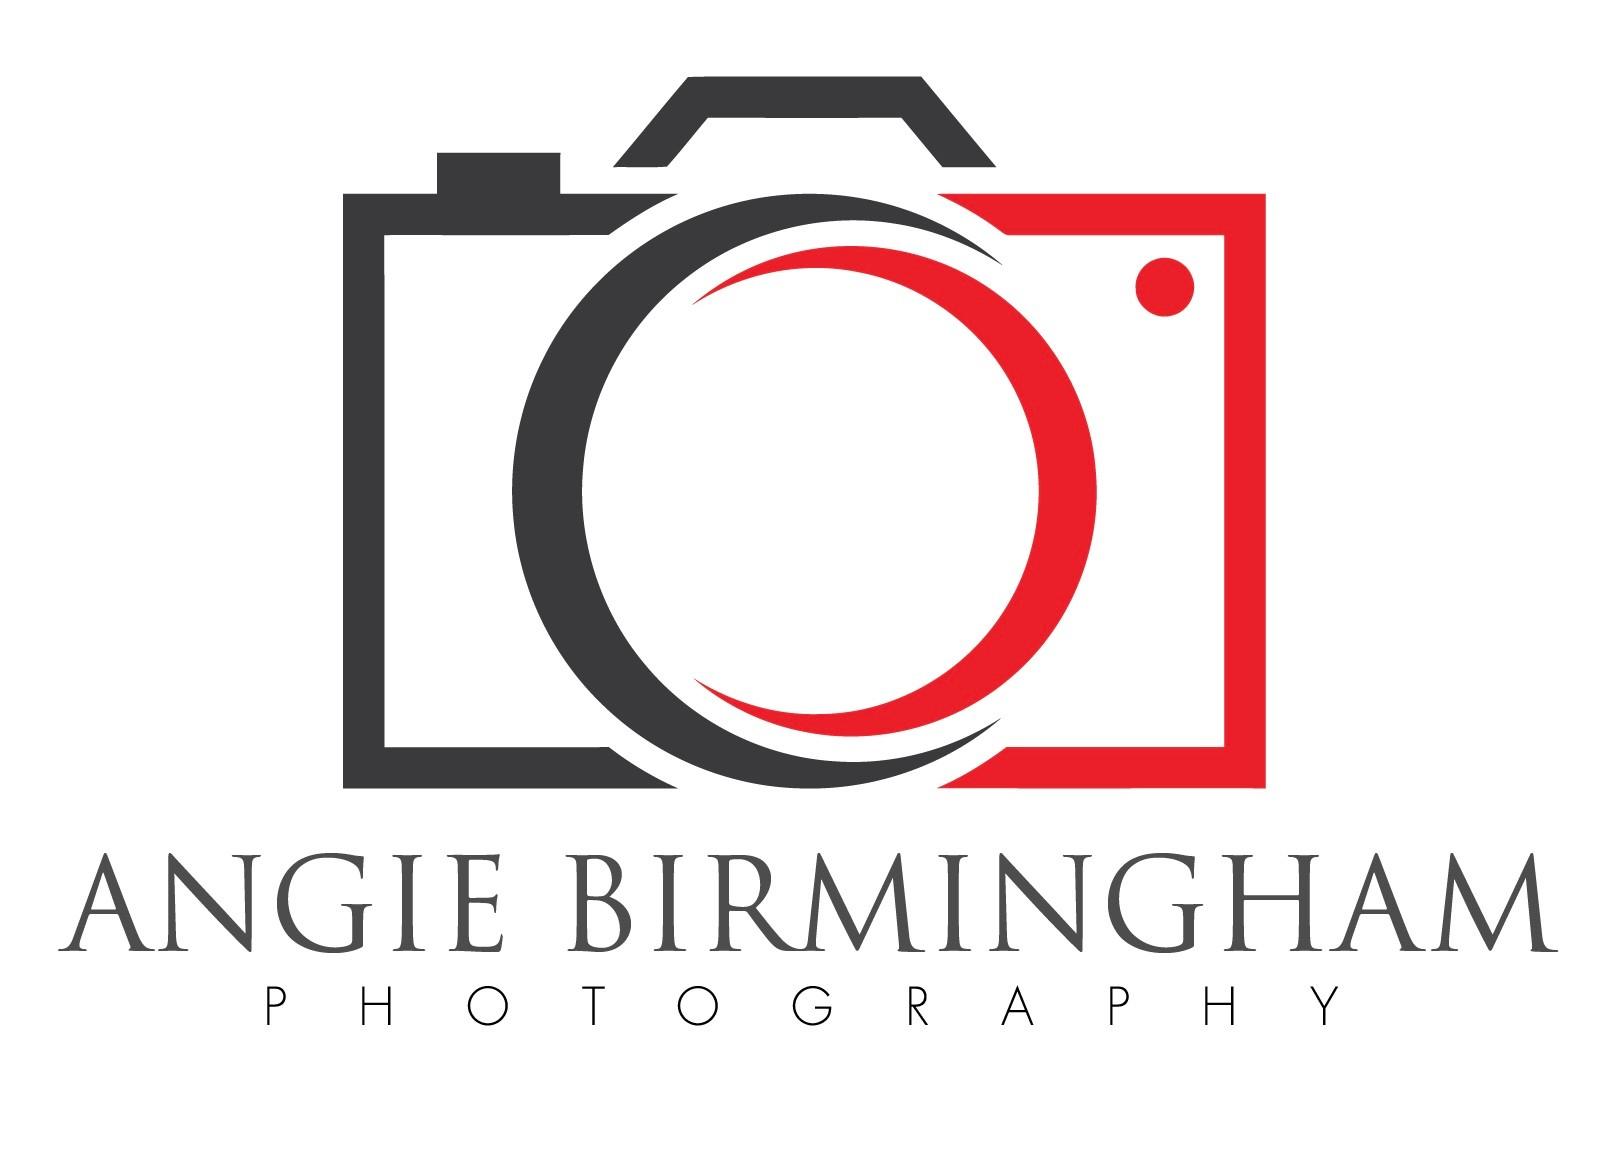 Angie Birmingham